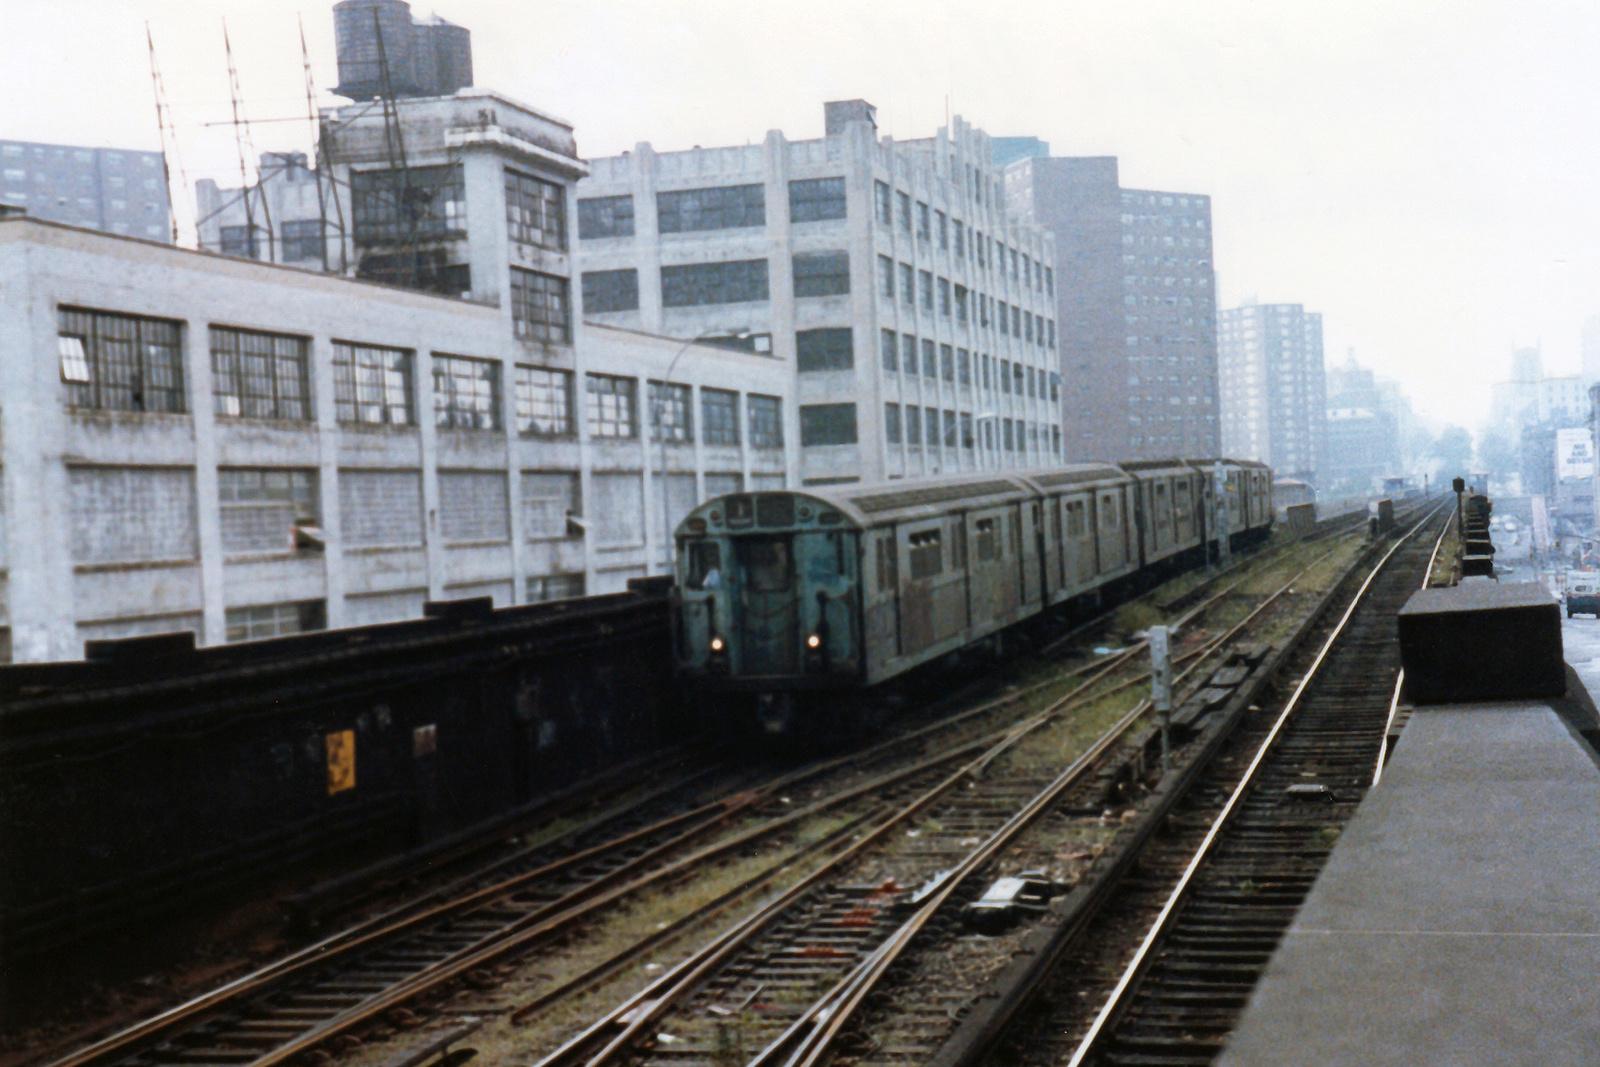 (683k, 1600x1067)<br><b>Country:</b> United States<br><b>City:</b> New York<br><b>System:</b> New York City Transit<br><b>Line:</b> IRT West Side Line<br><b>Location:</b> 125th Street <br><b>Route:</b> 1<br><b>Car:</b> R-36 World's Fair (St. Louis, 1963-64)  <br><b>Collection of:</b> Nicholas Fabrizio<br><b>Viewed (this week/total):</b> 0 / 501